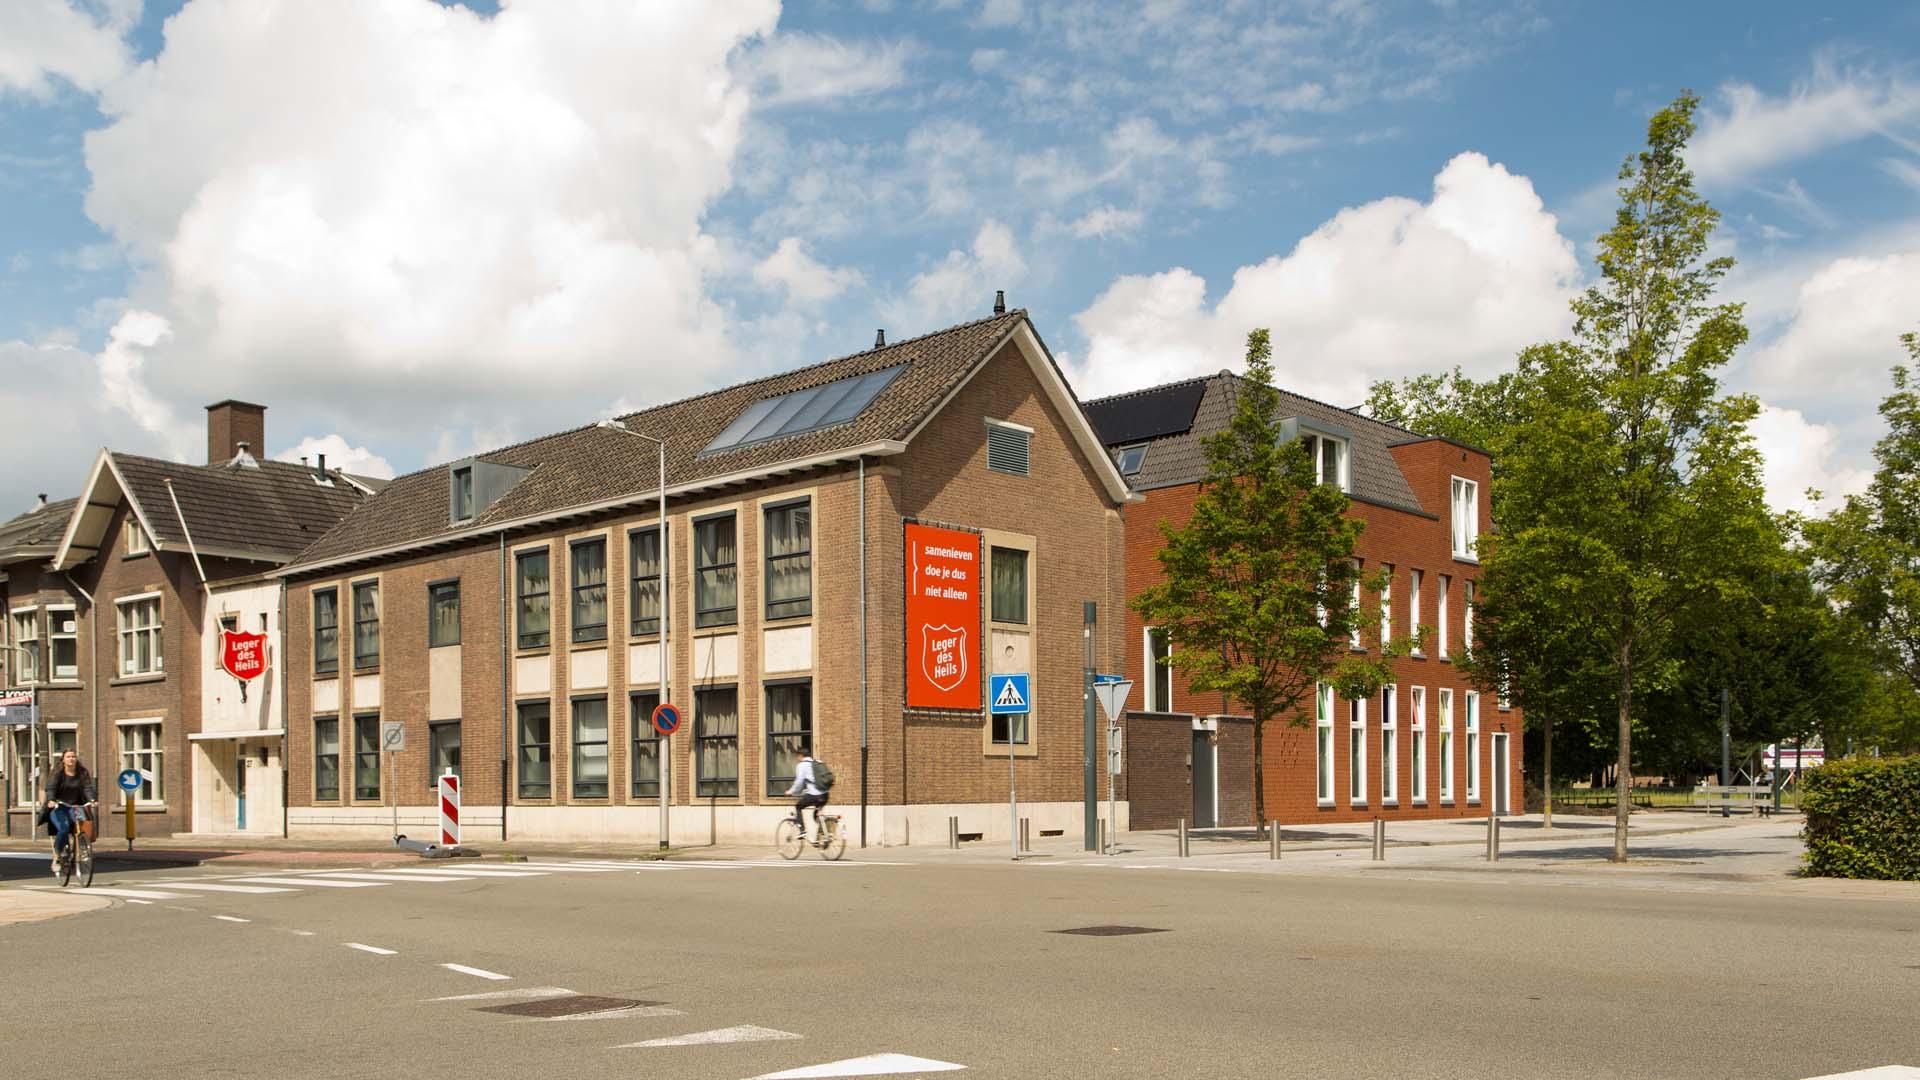 1318_Leger des Heils Molenweg Willem Brakmanstraat Enschede_01